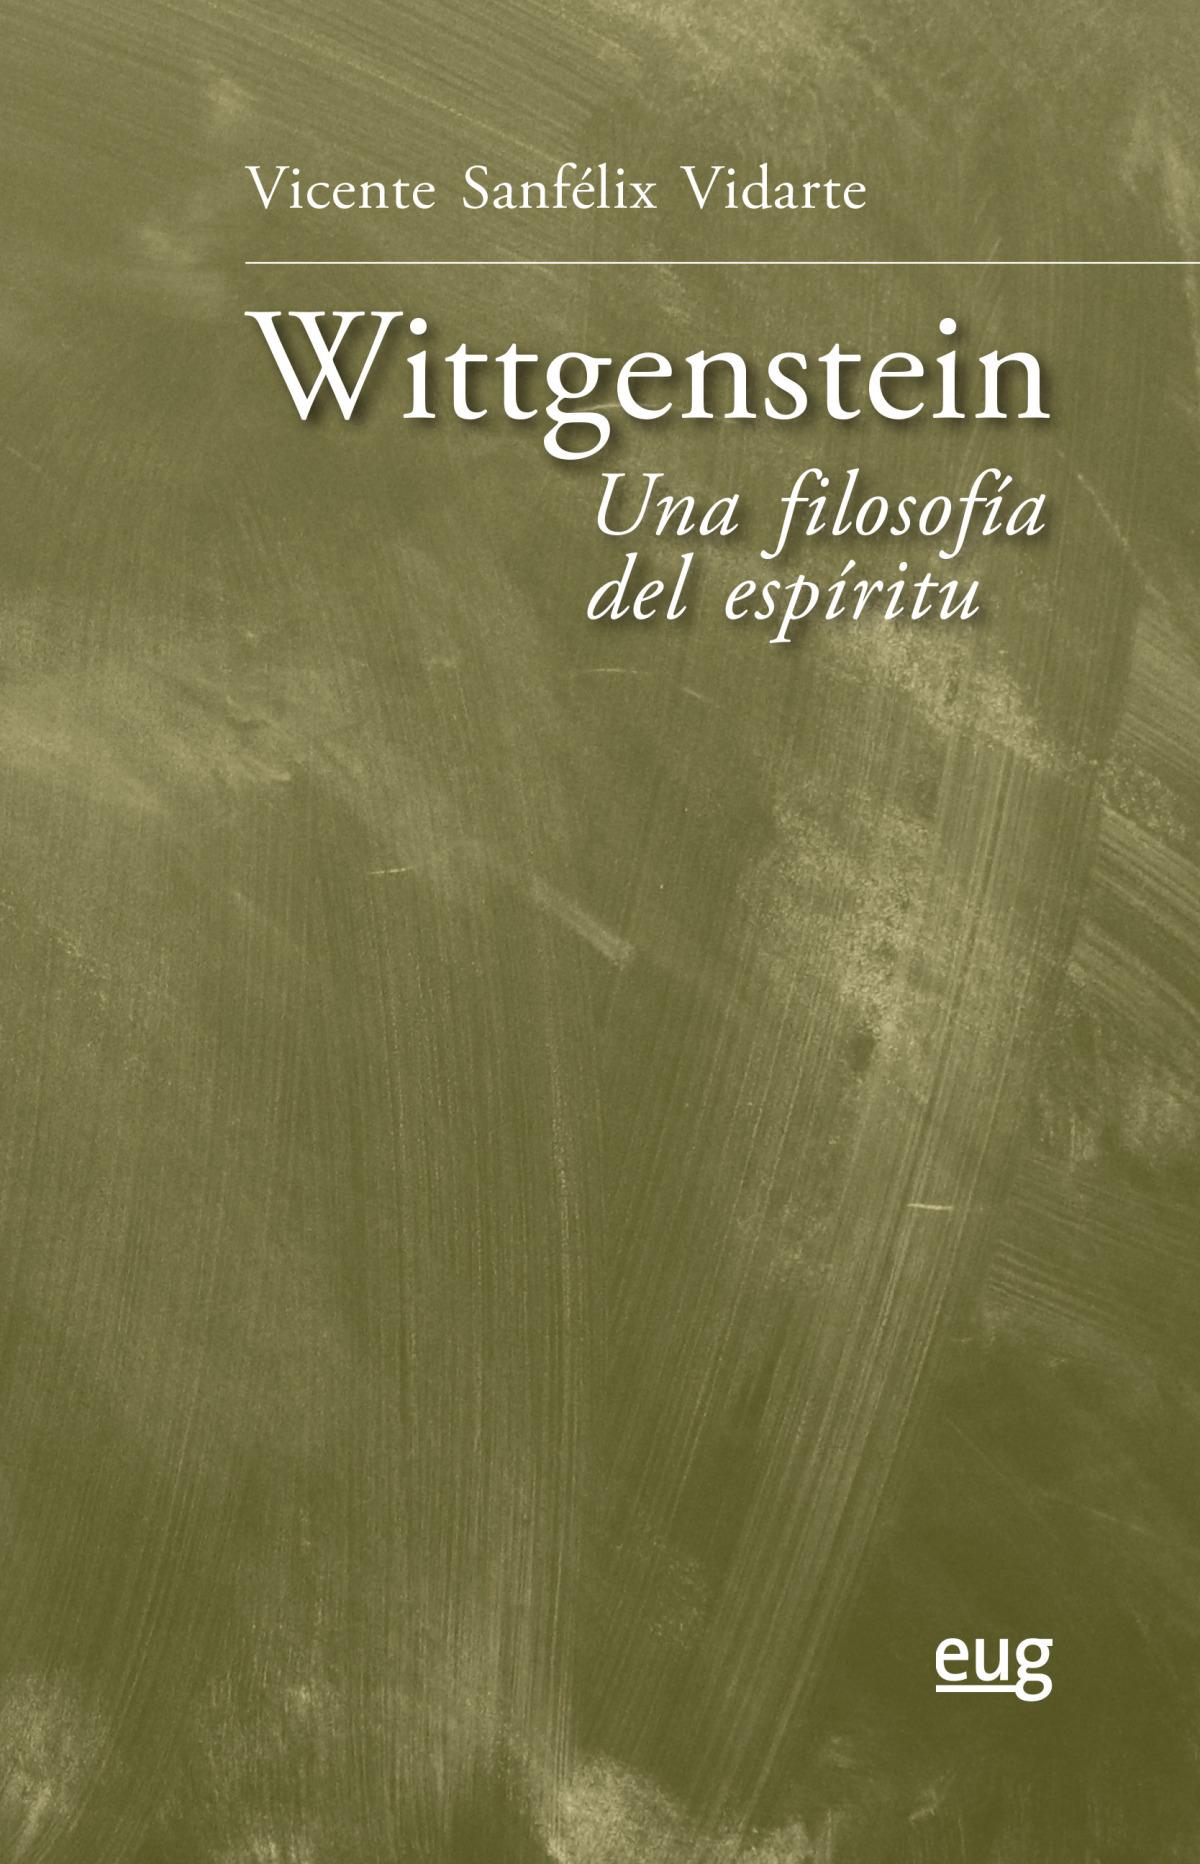 Wittgenstein: una filosofía del espíritu